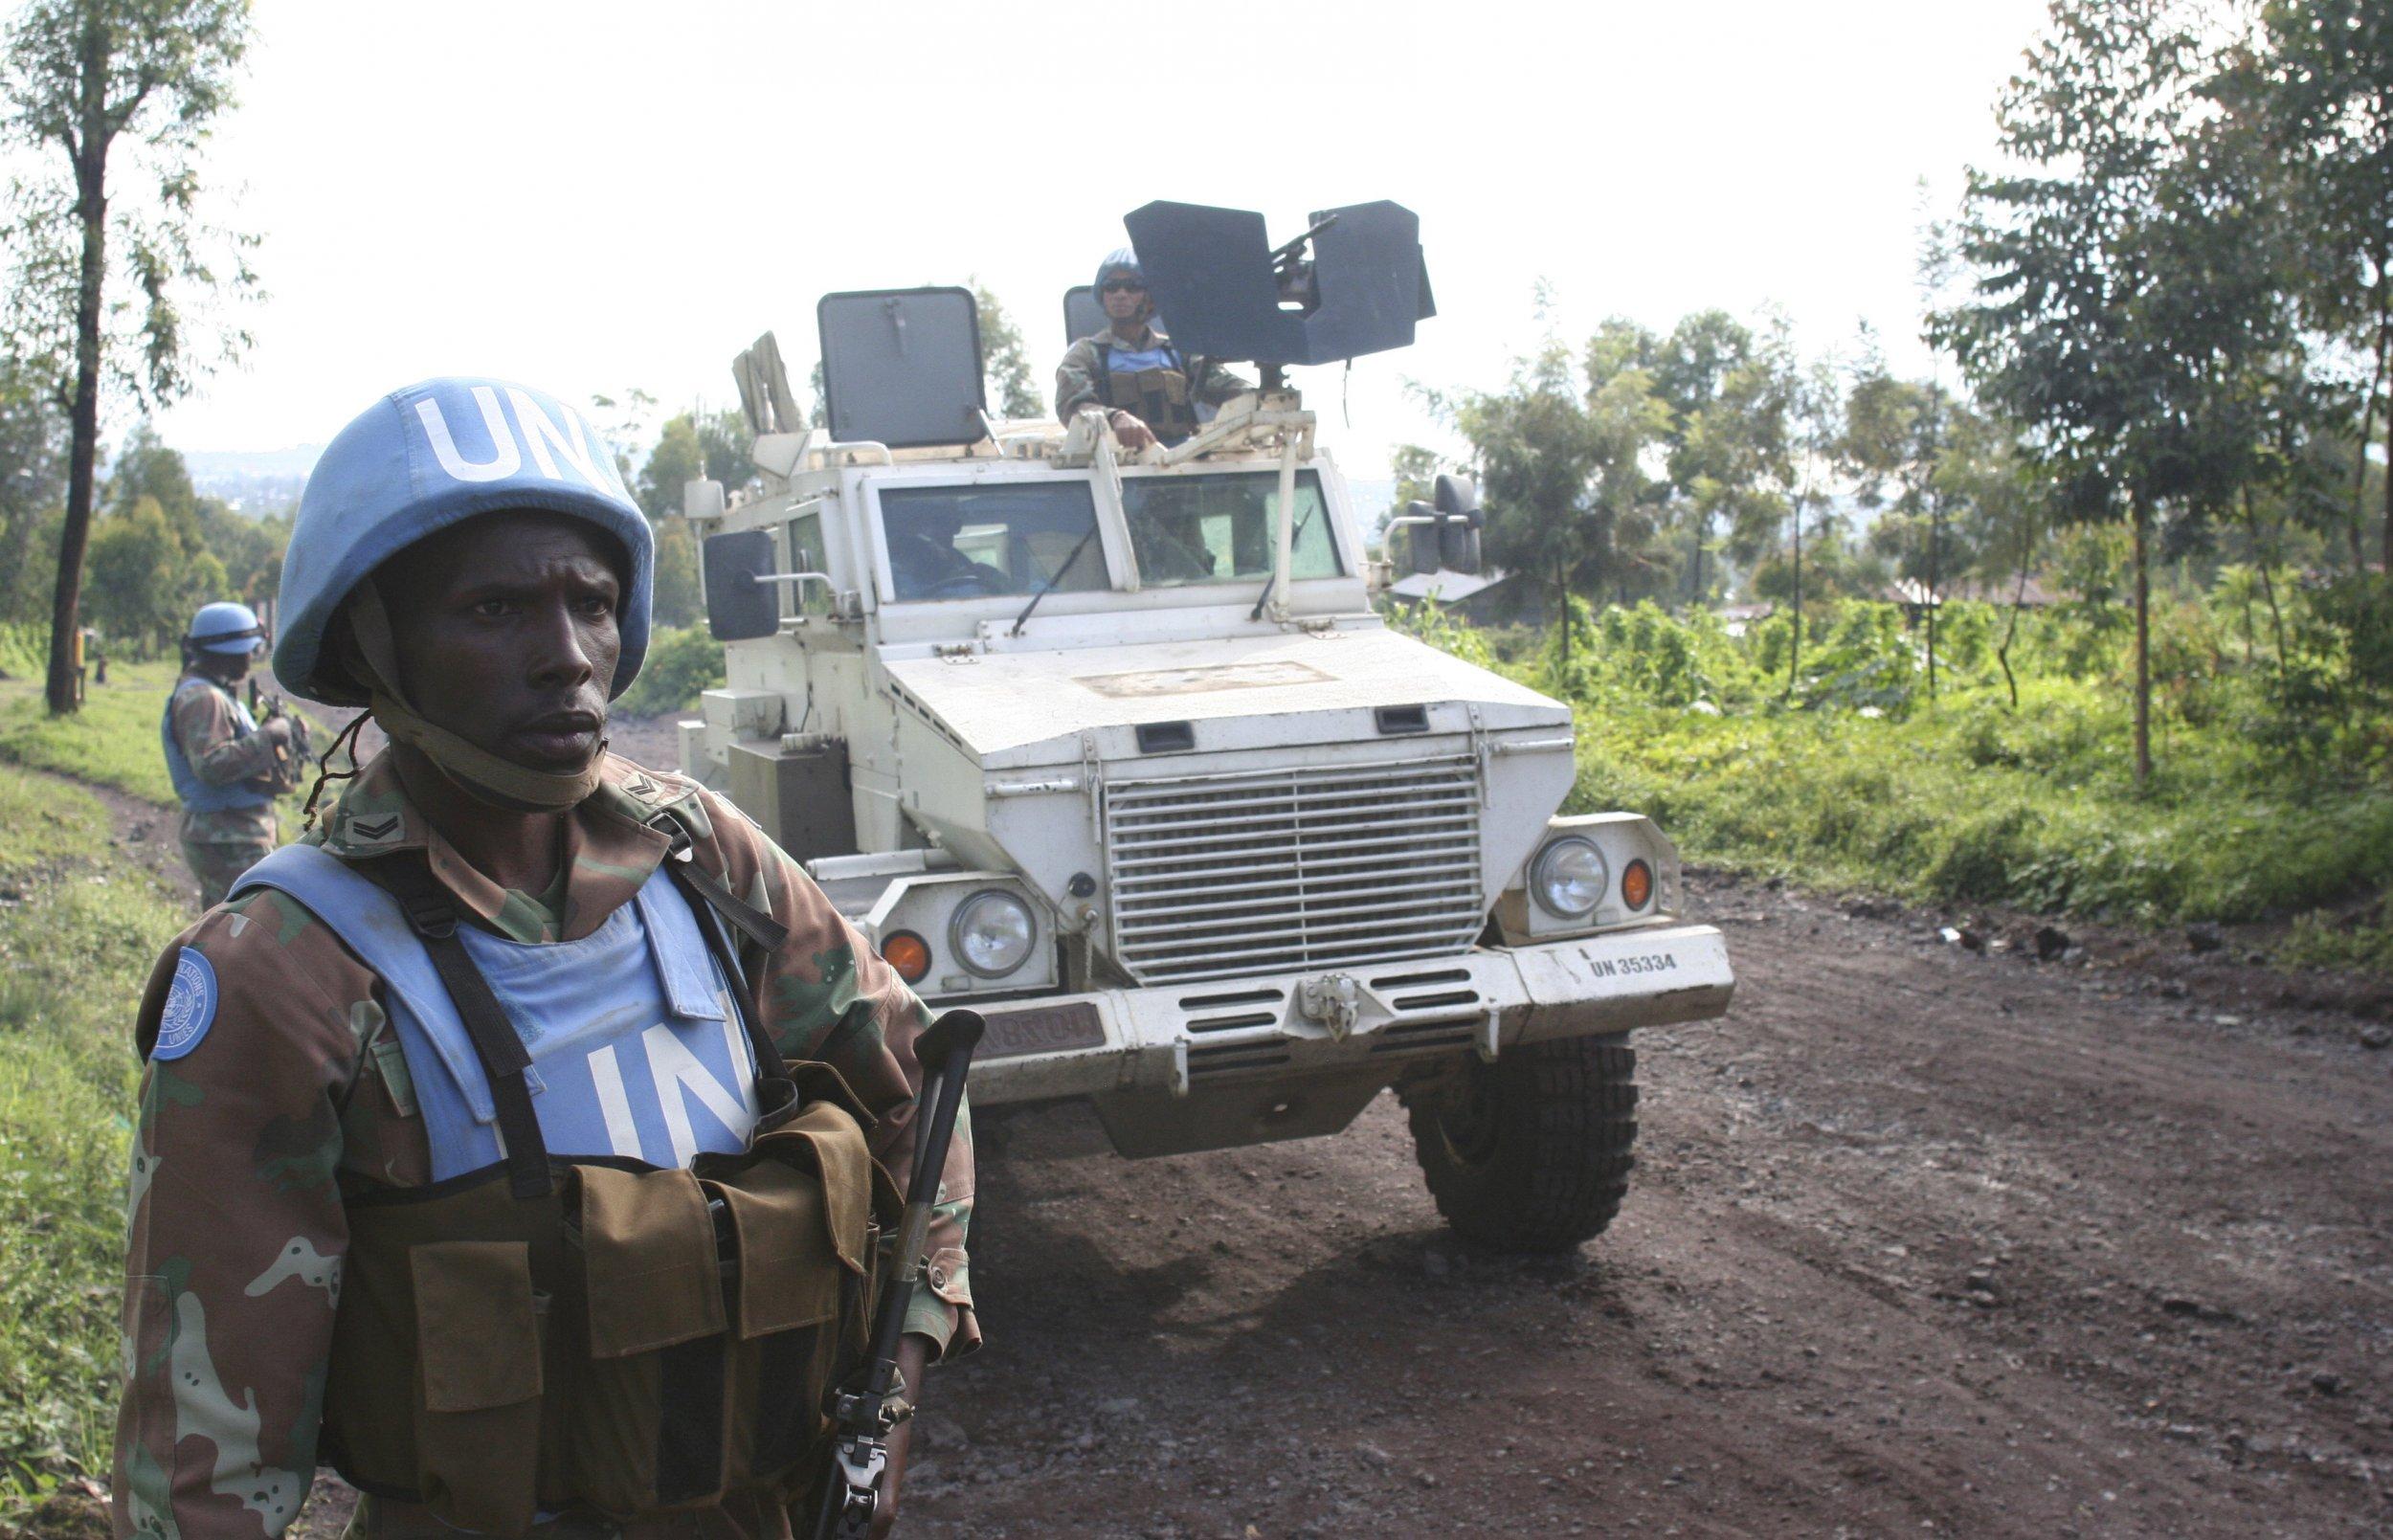 U.N. peacekeepers patrol in Goma, eastern Democratic Republic of Congo.